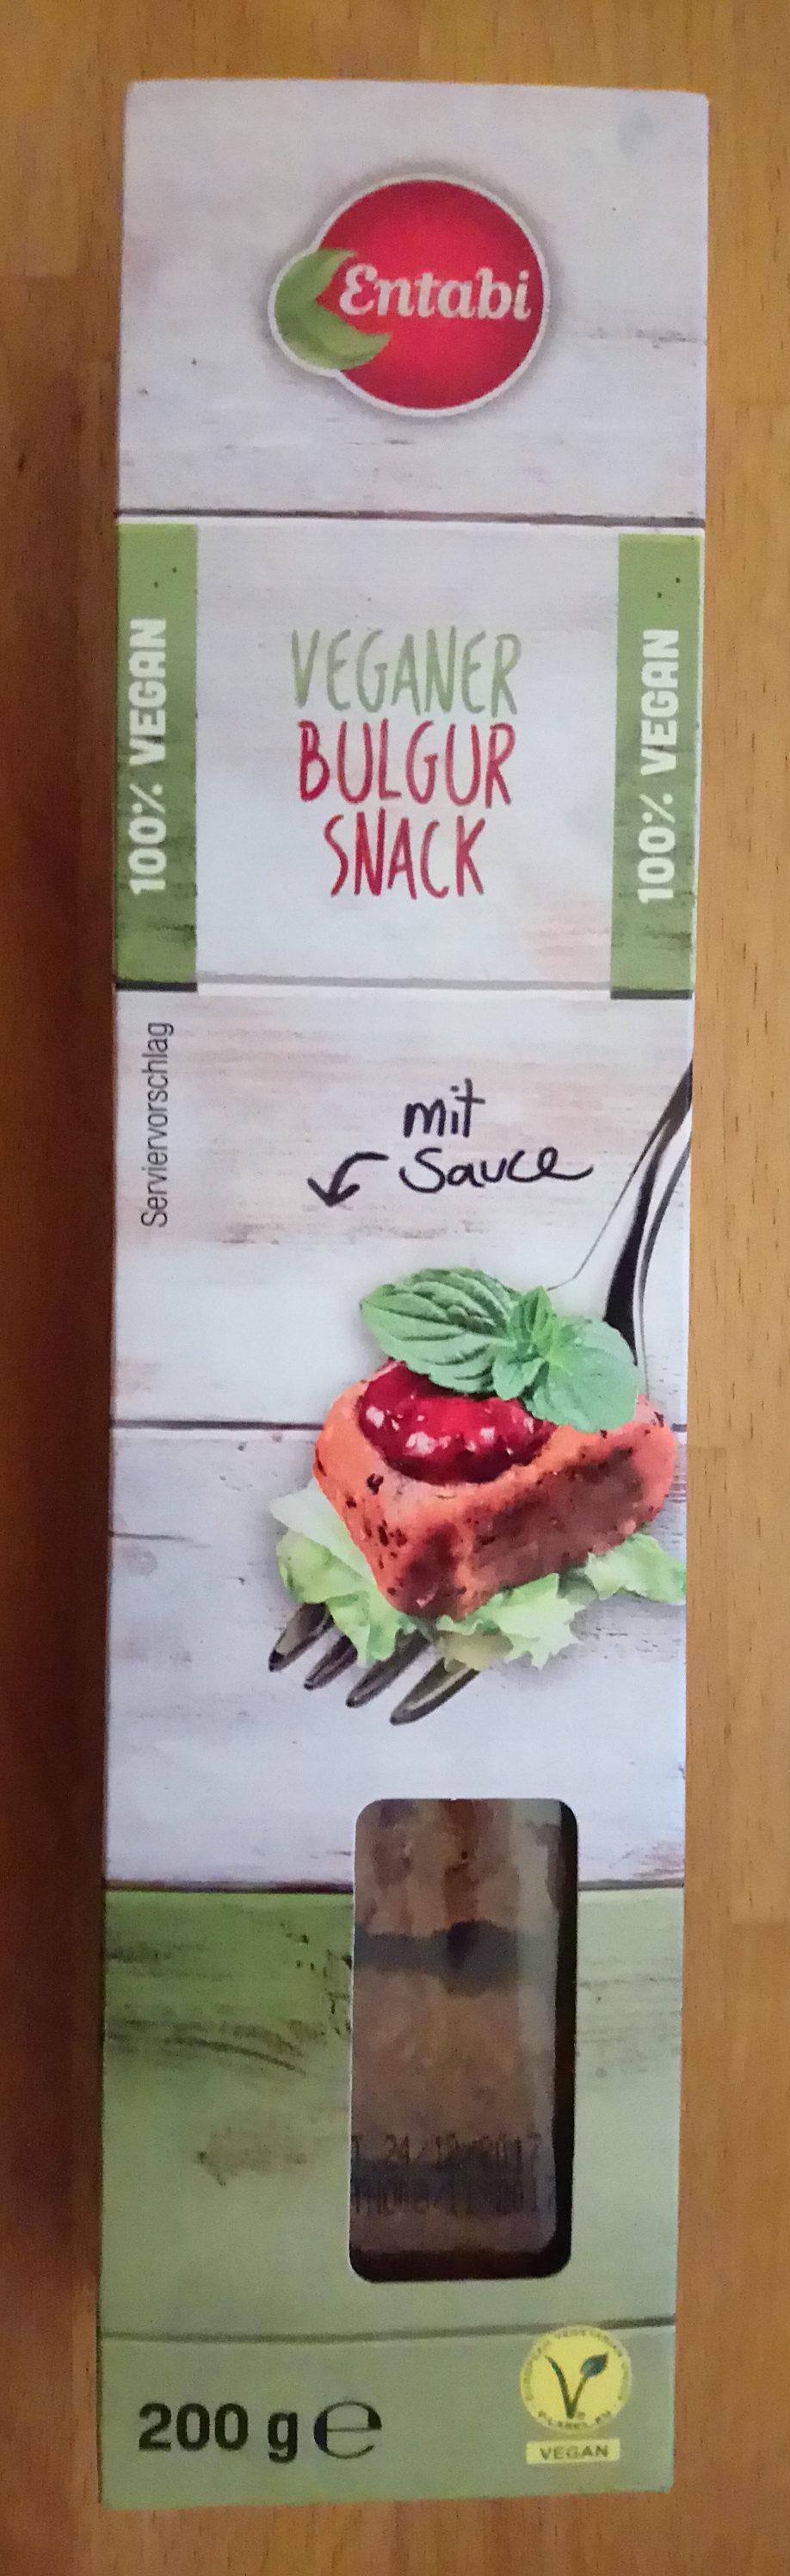 Veganer Bulgur Snack - Produit